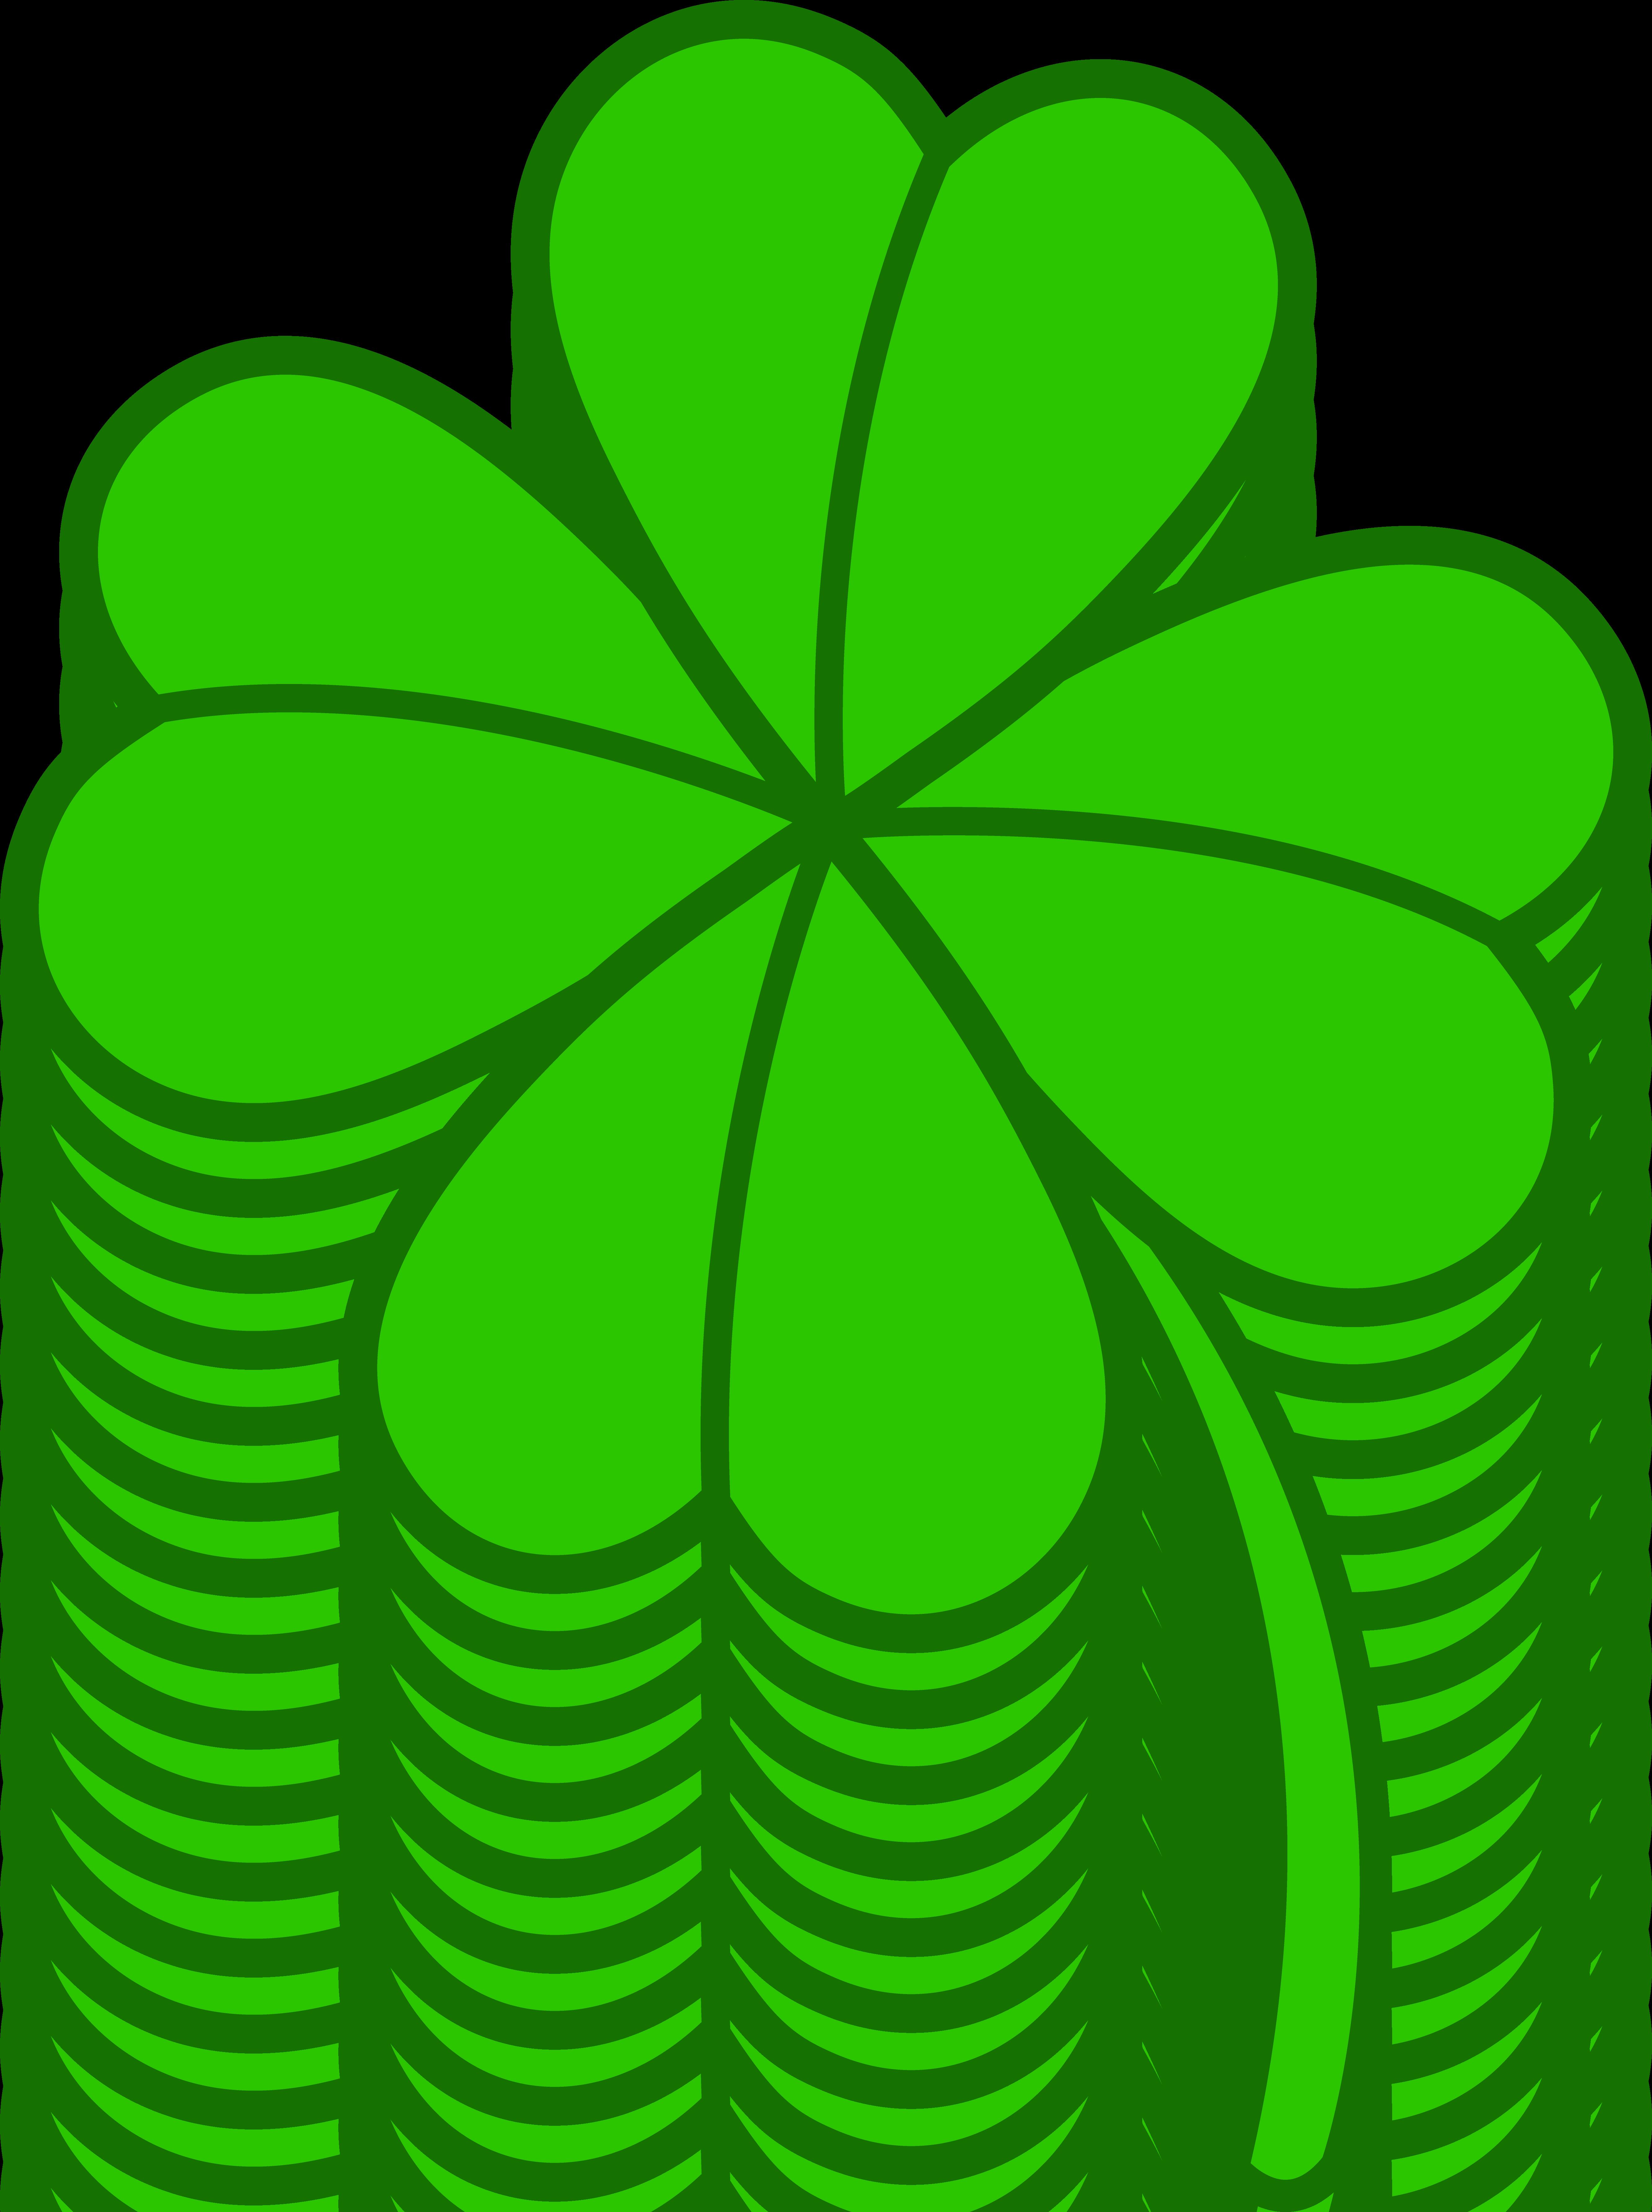 Clover clipart simple. Four leaf version free